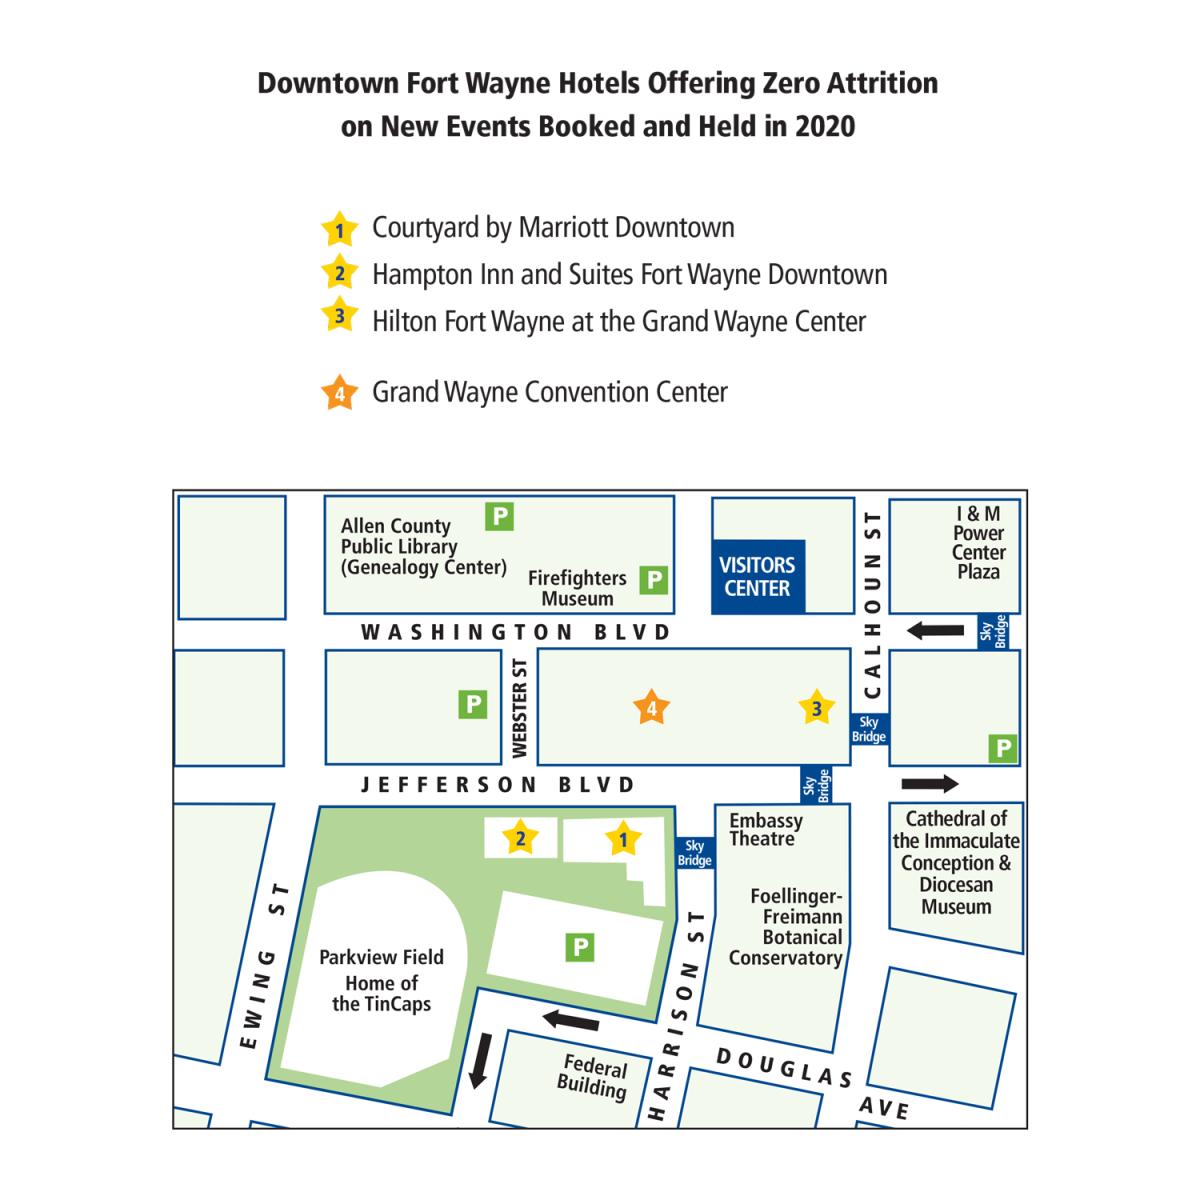 Zero Attrition Downtown Map